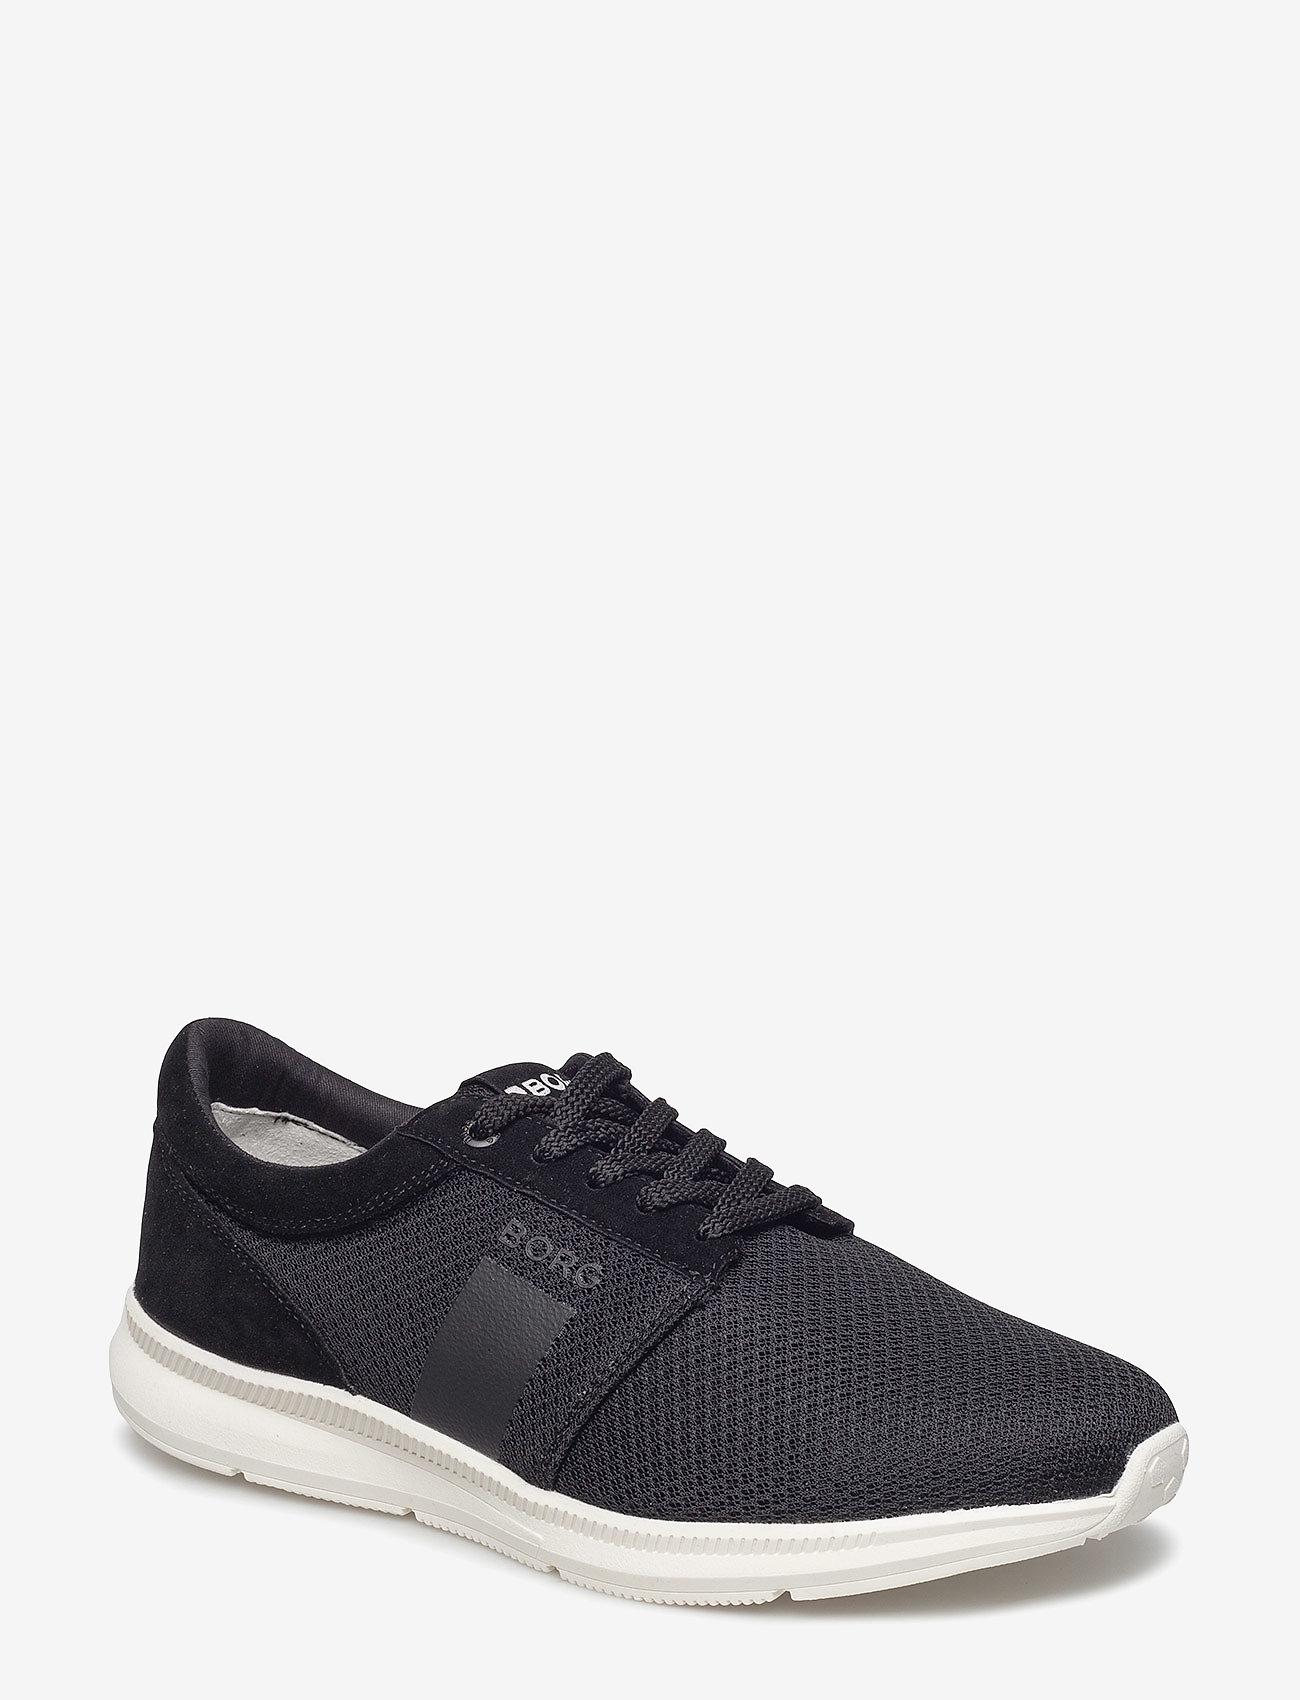 Björn Borg - R500 Low Msh M - laag sneakers - black - 0